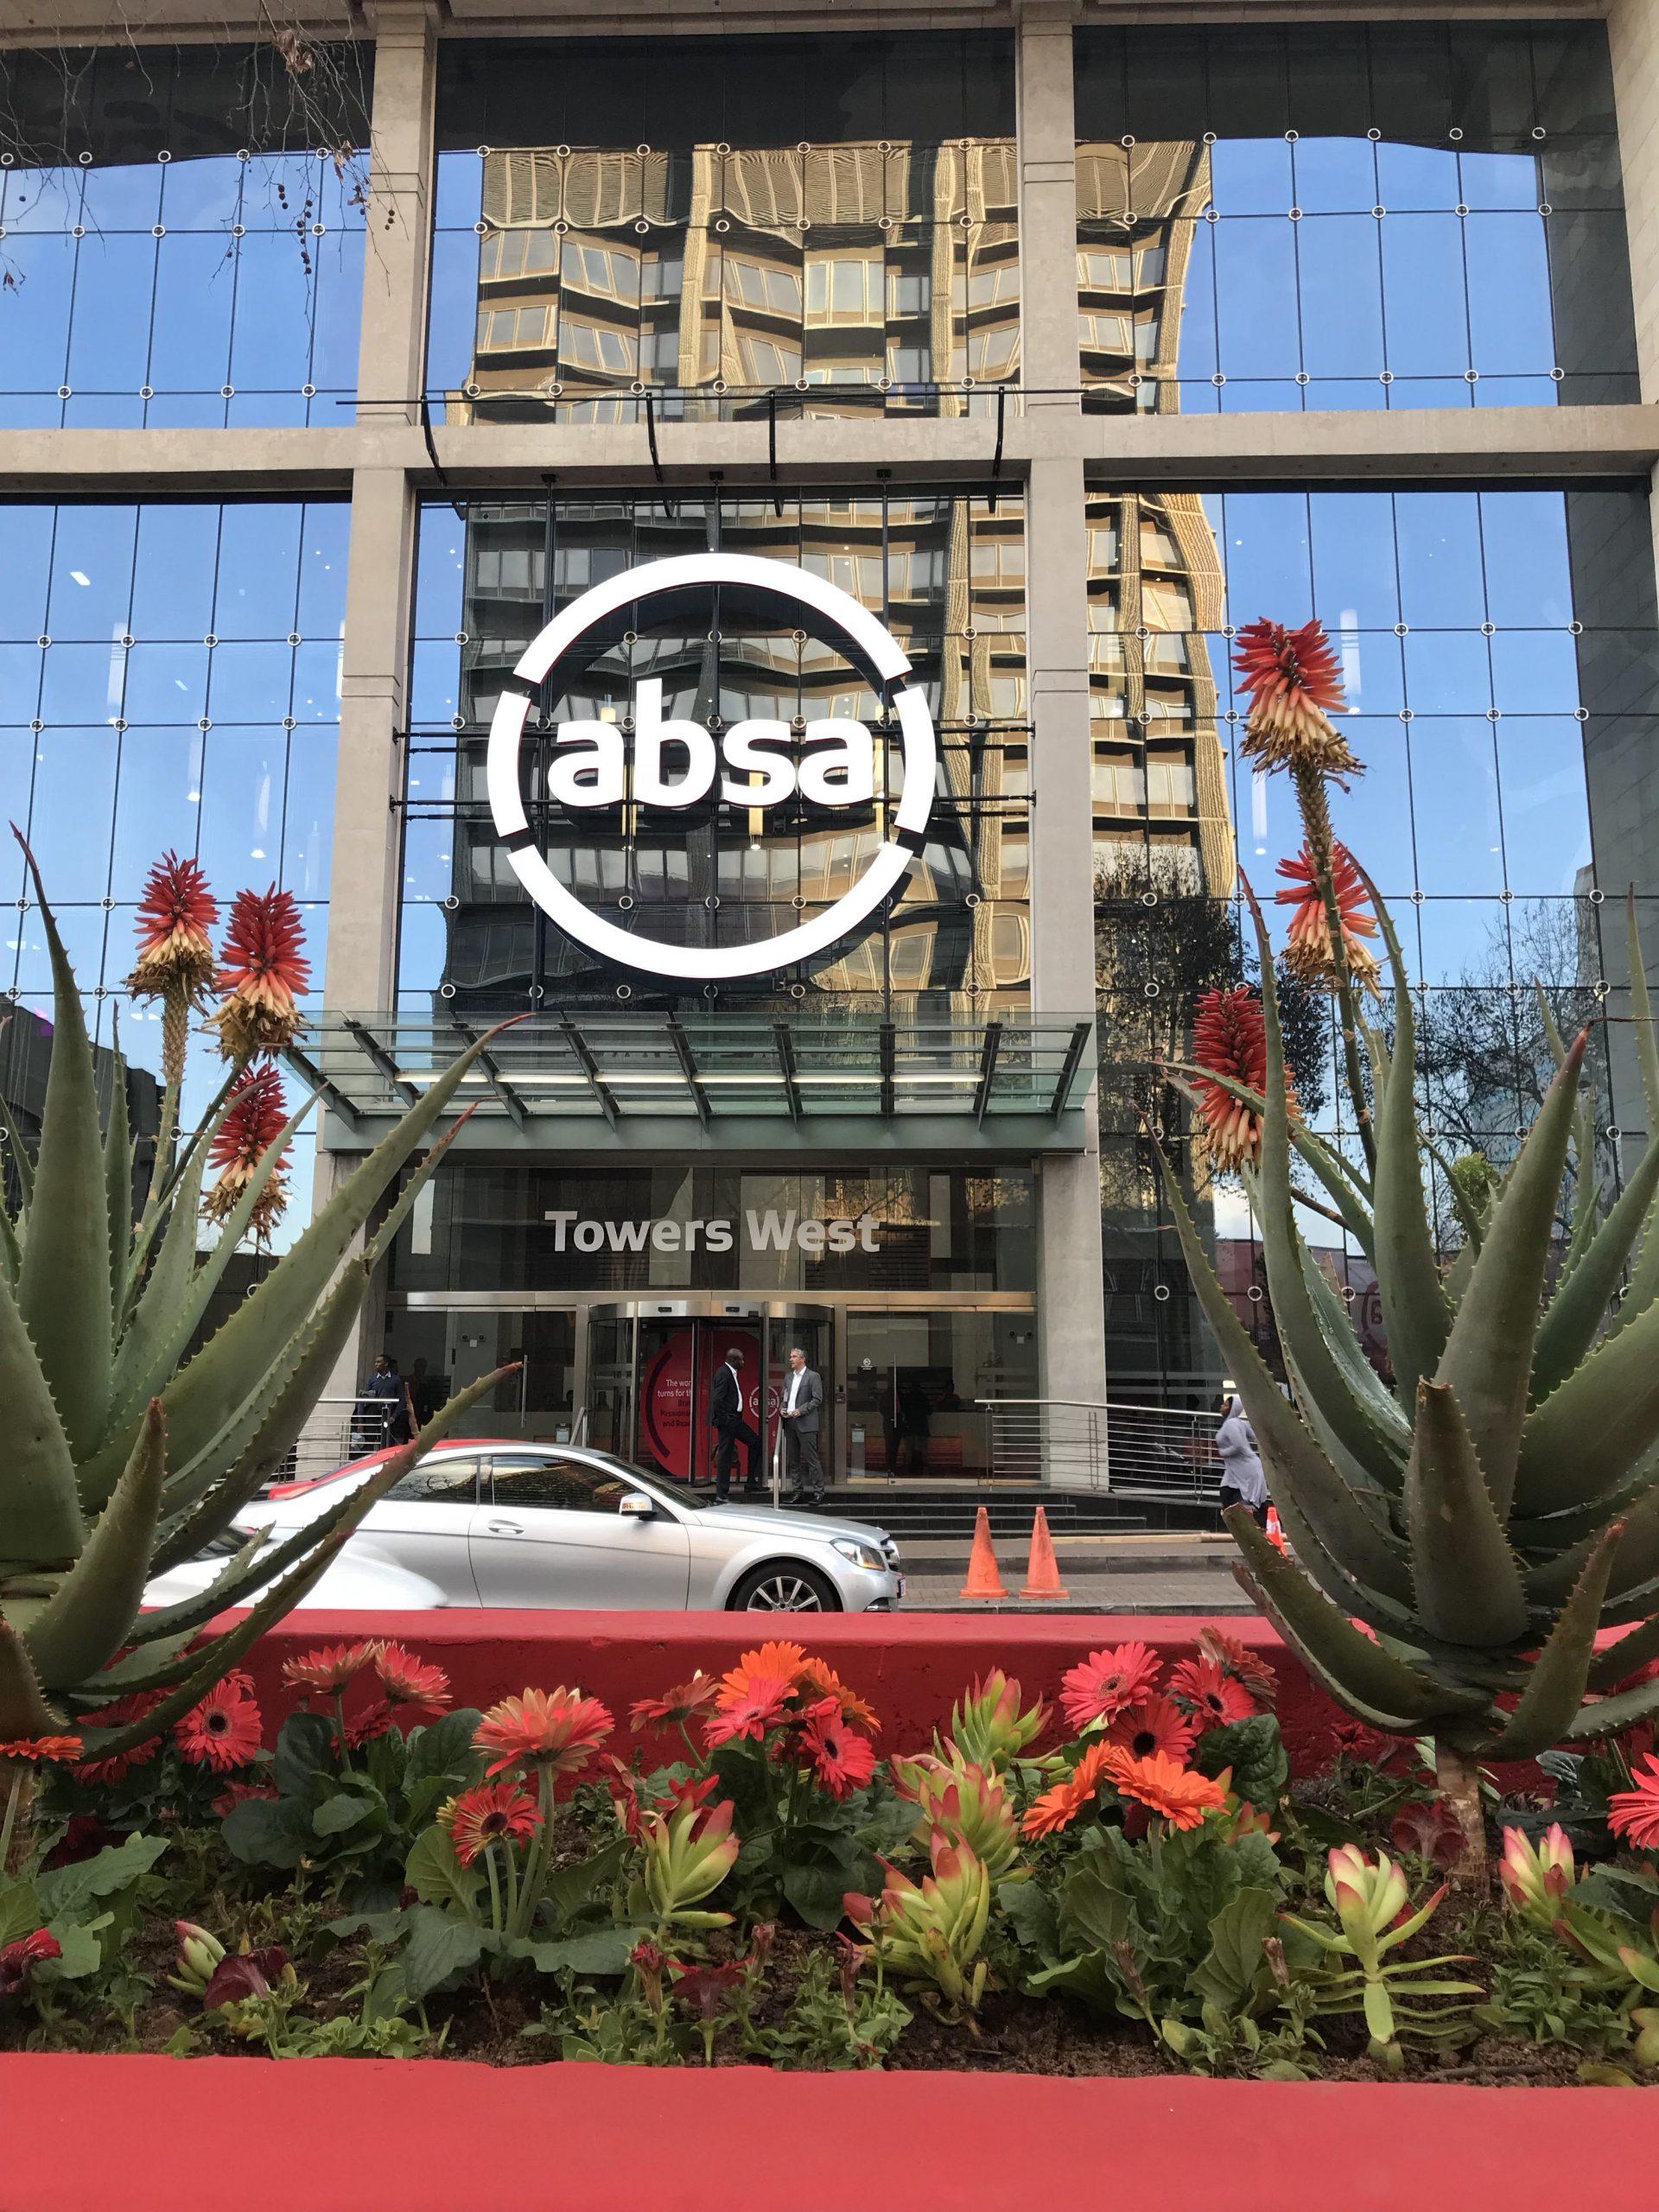 Amorphous_Account-based marketing & advertising_ABSA